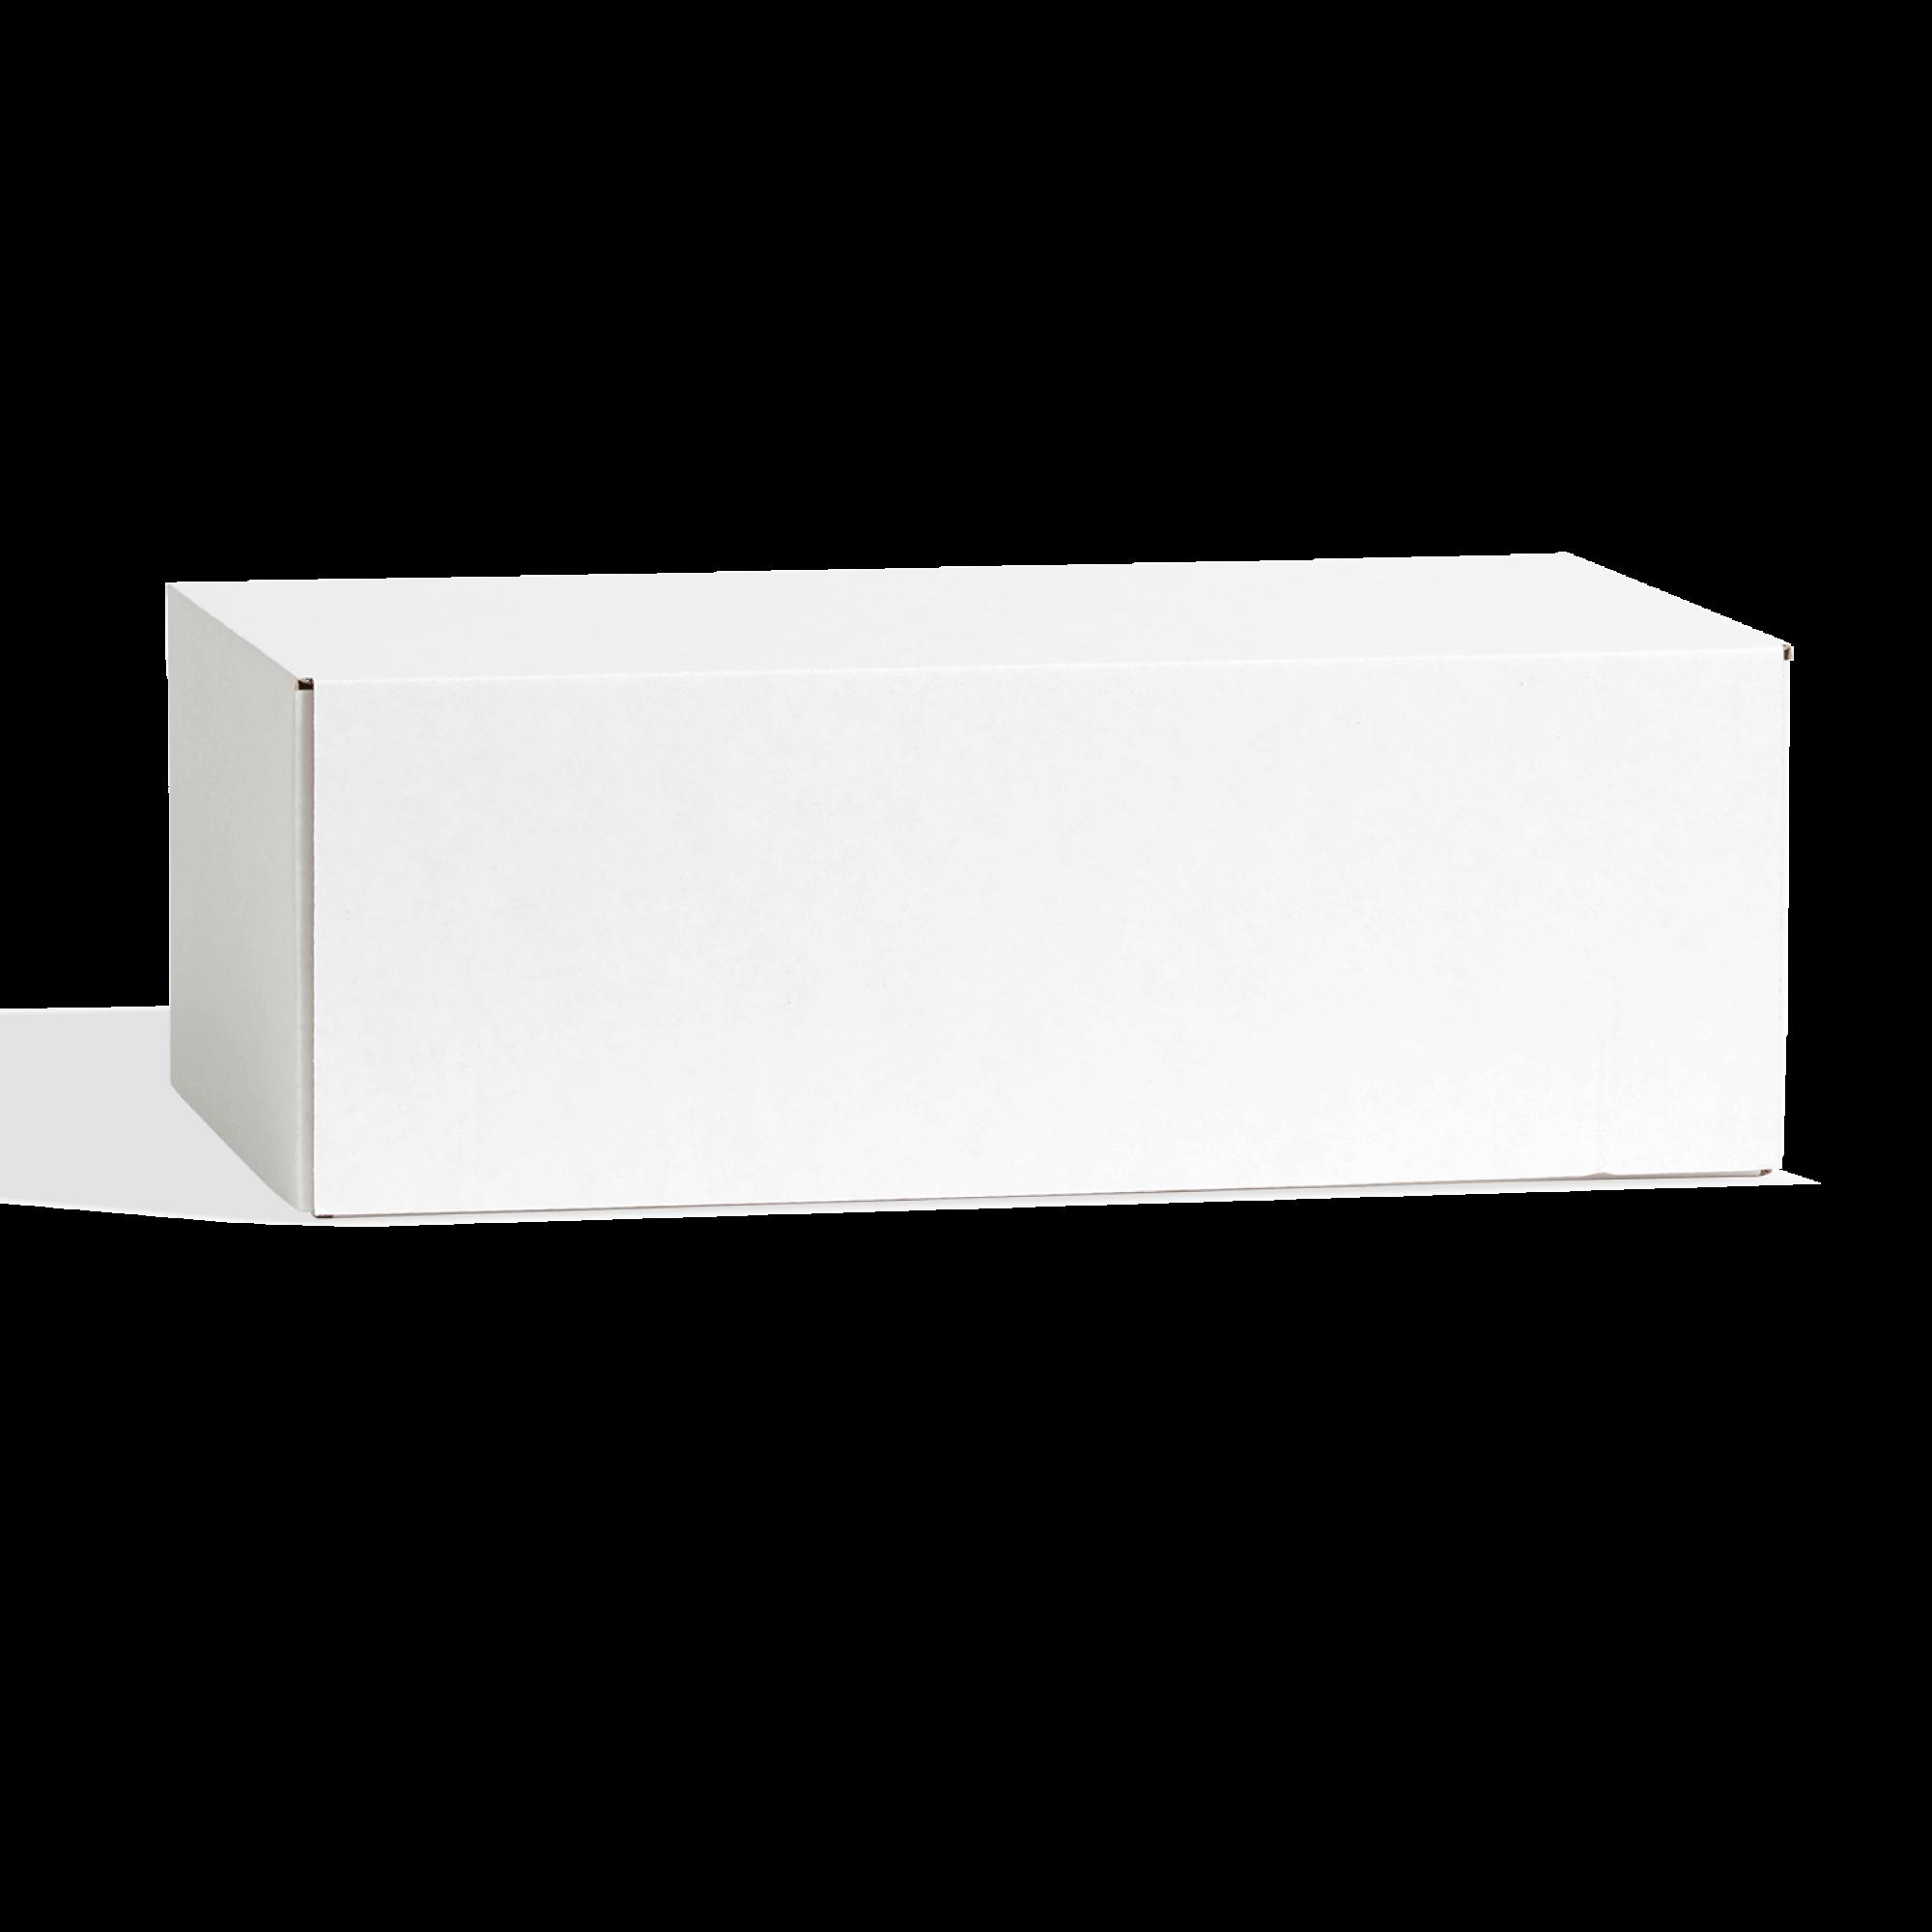 White customizable shoe box with deep lid